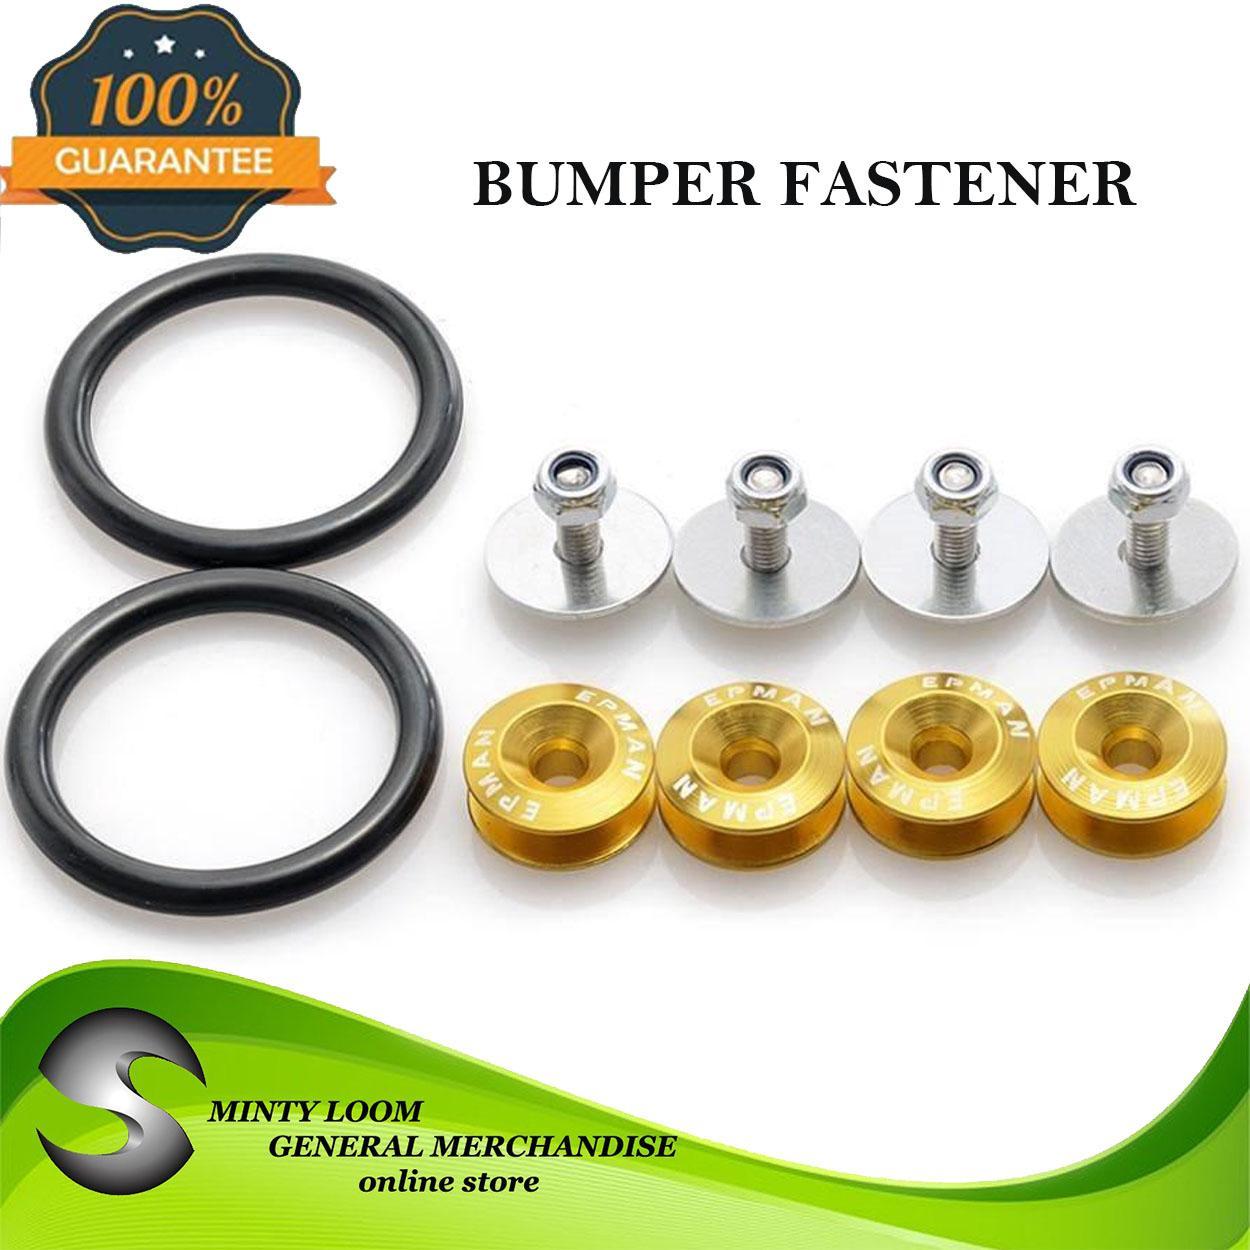 Jdm Password Bumper Fastener(gold) By Minty Loom General Merchandise.